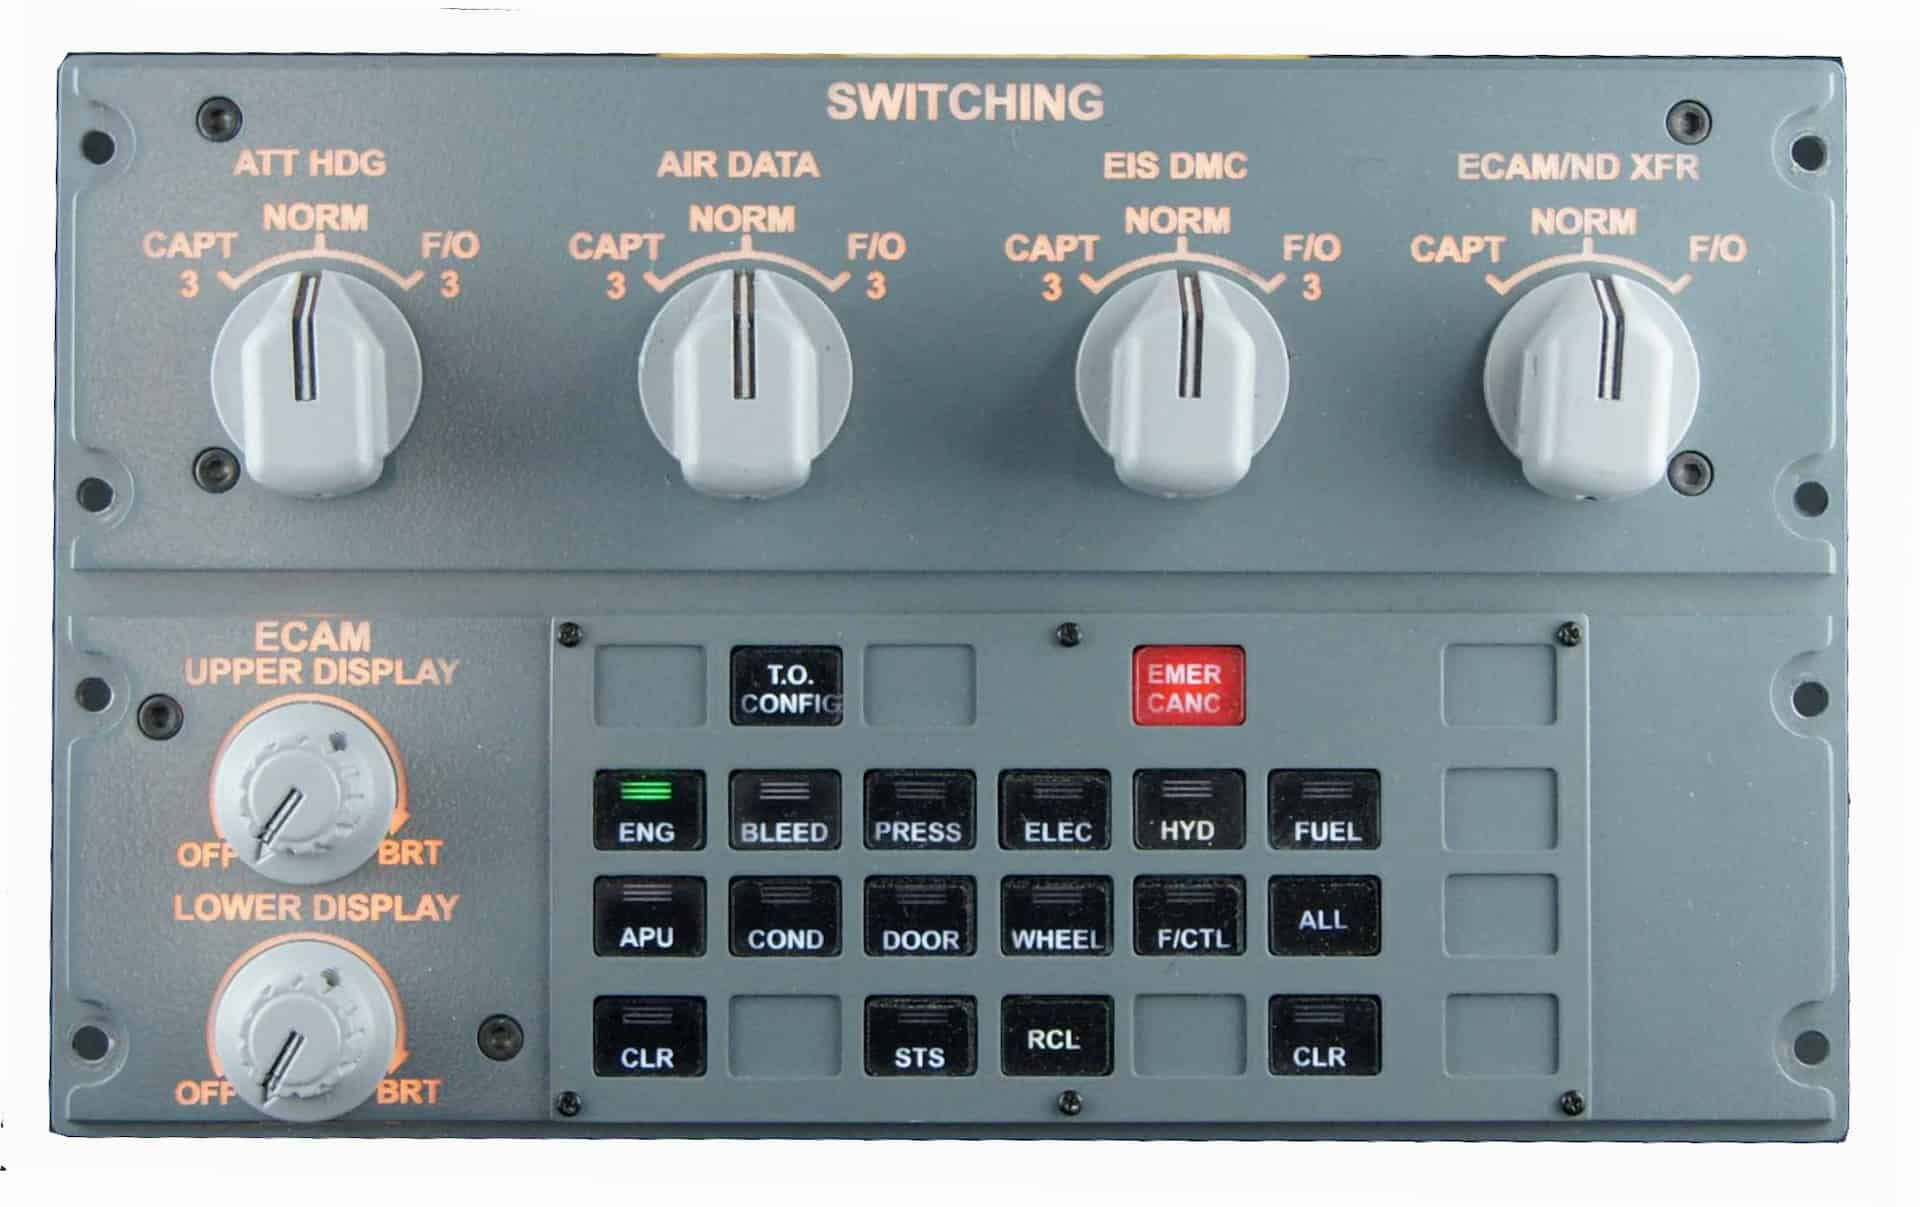 ECAM & Switching Module